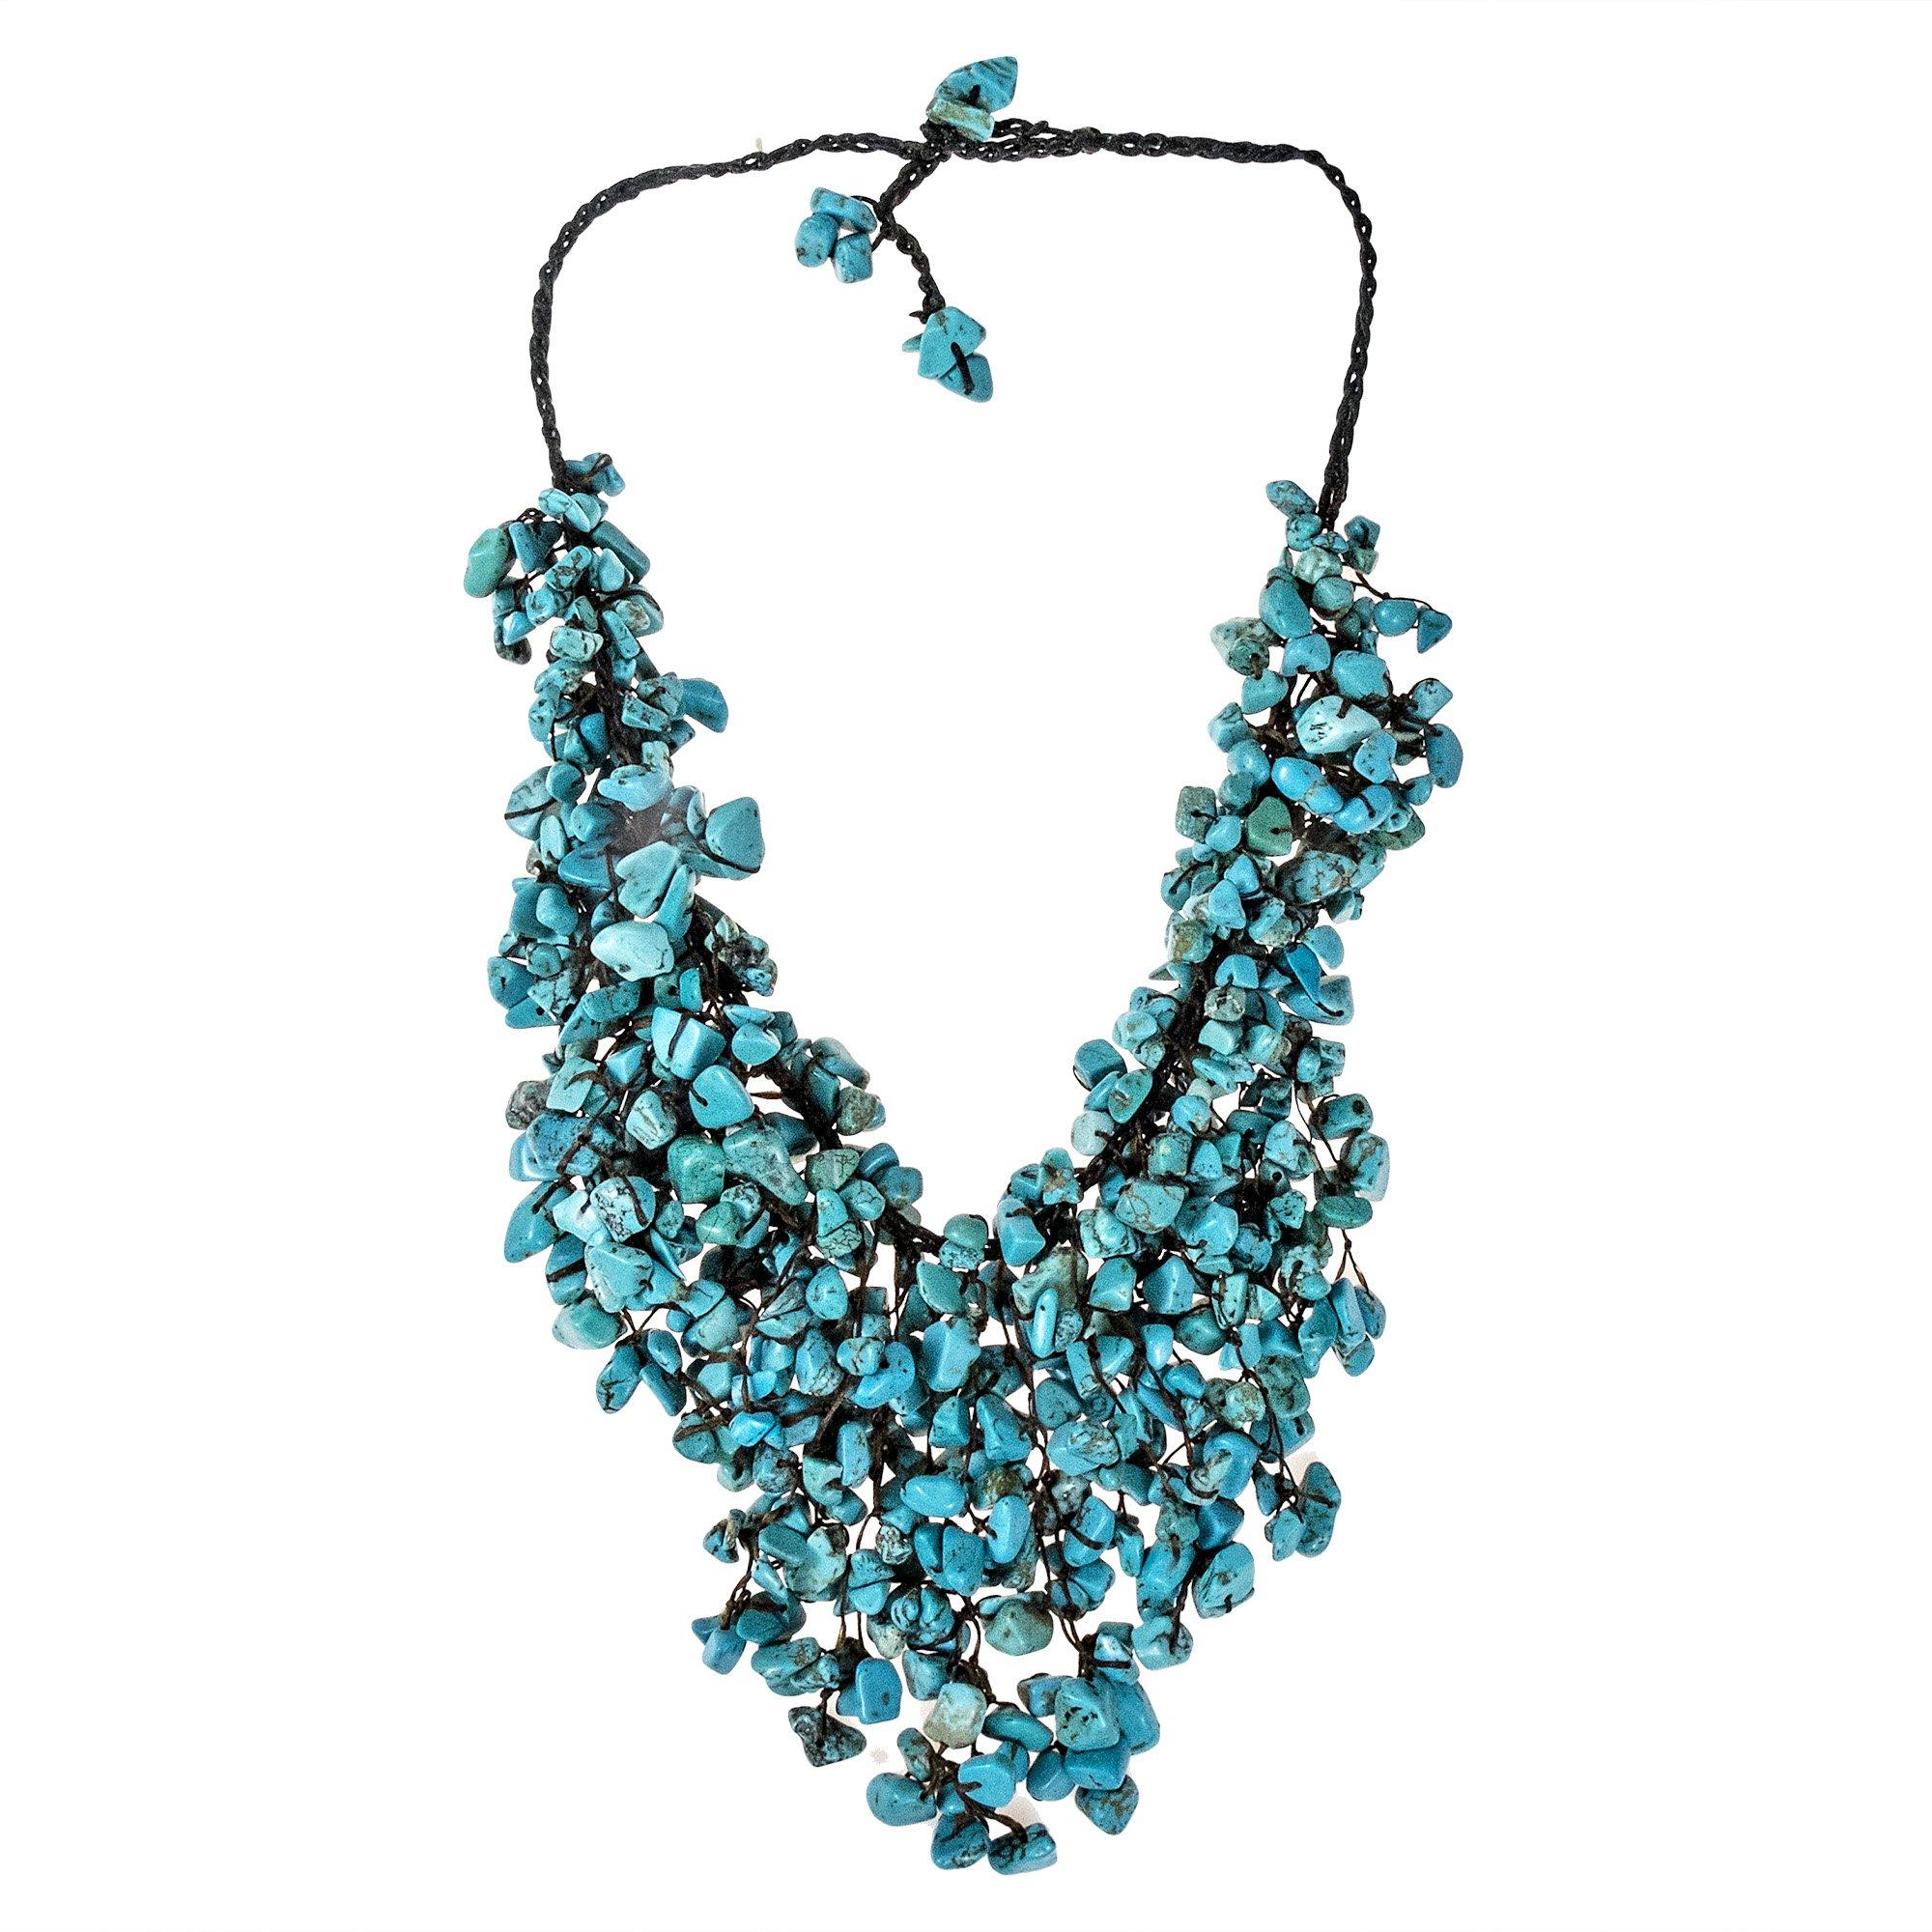 AeraVida Handmade Simulated Turquoise Waterfall On Cotton Wax Rope Bib-Style Statement Toggle Necklace